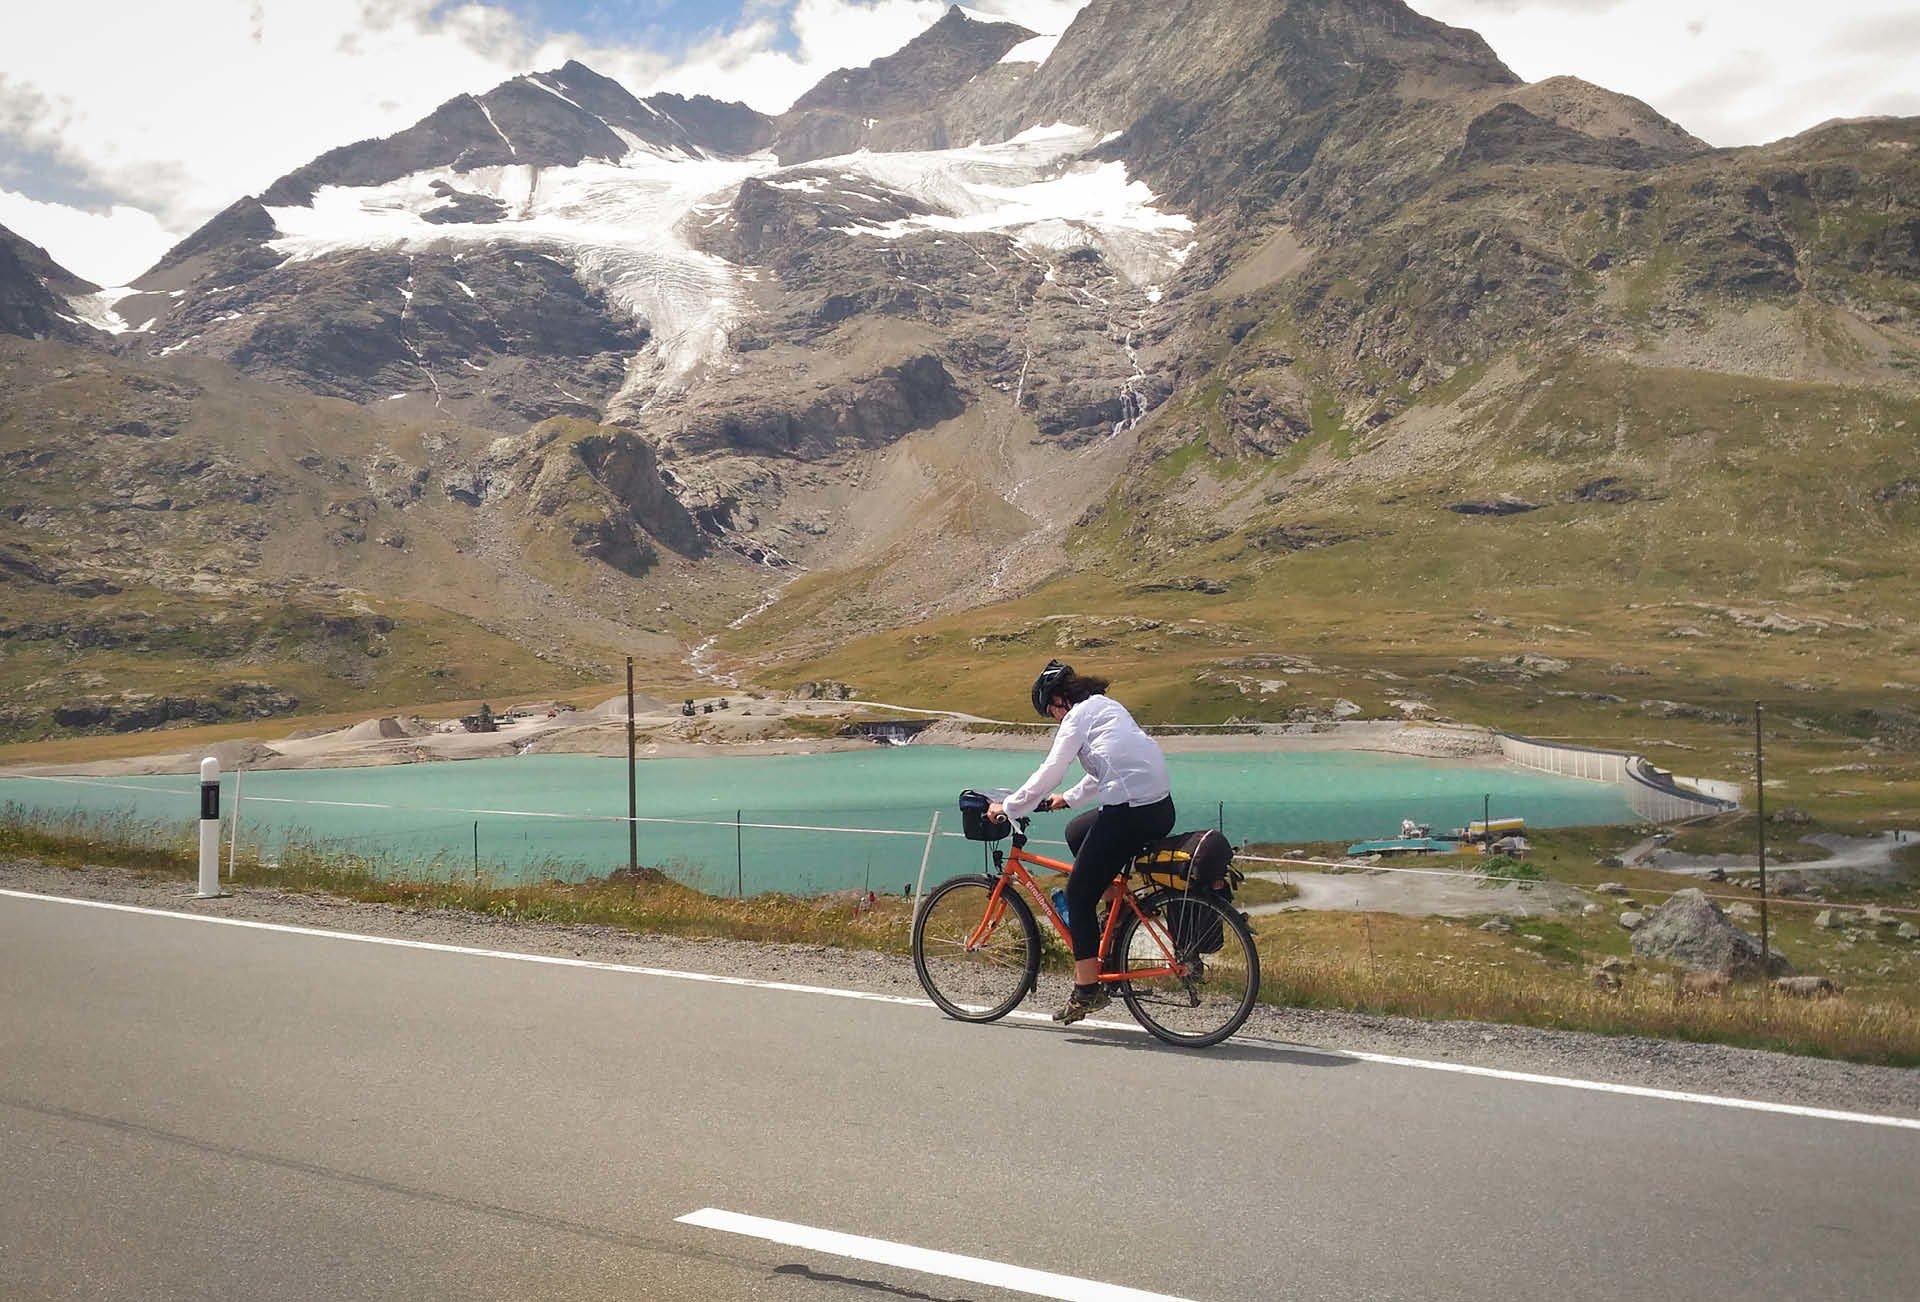 alpenradtour4.jpg